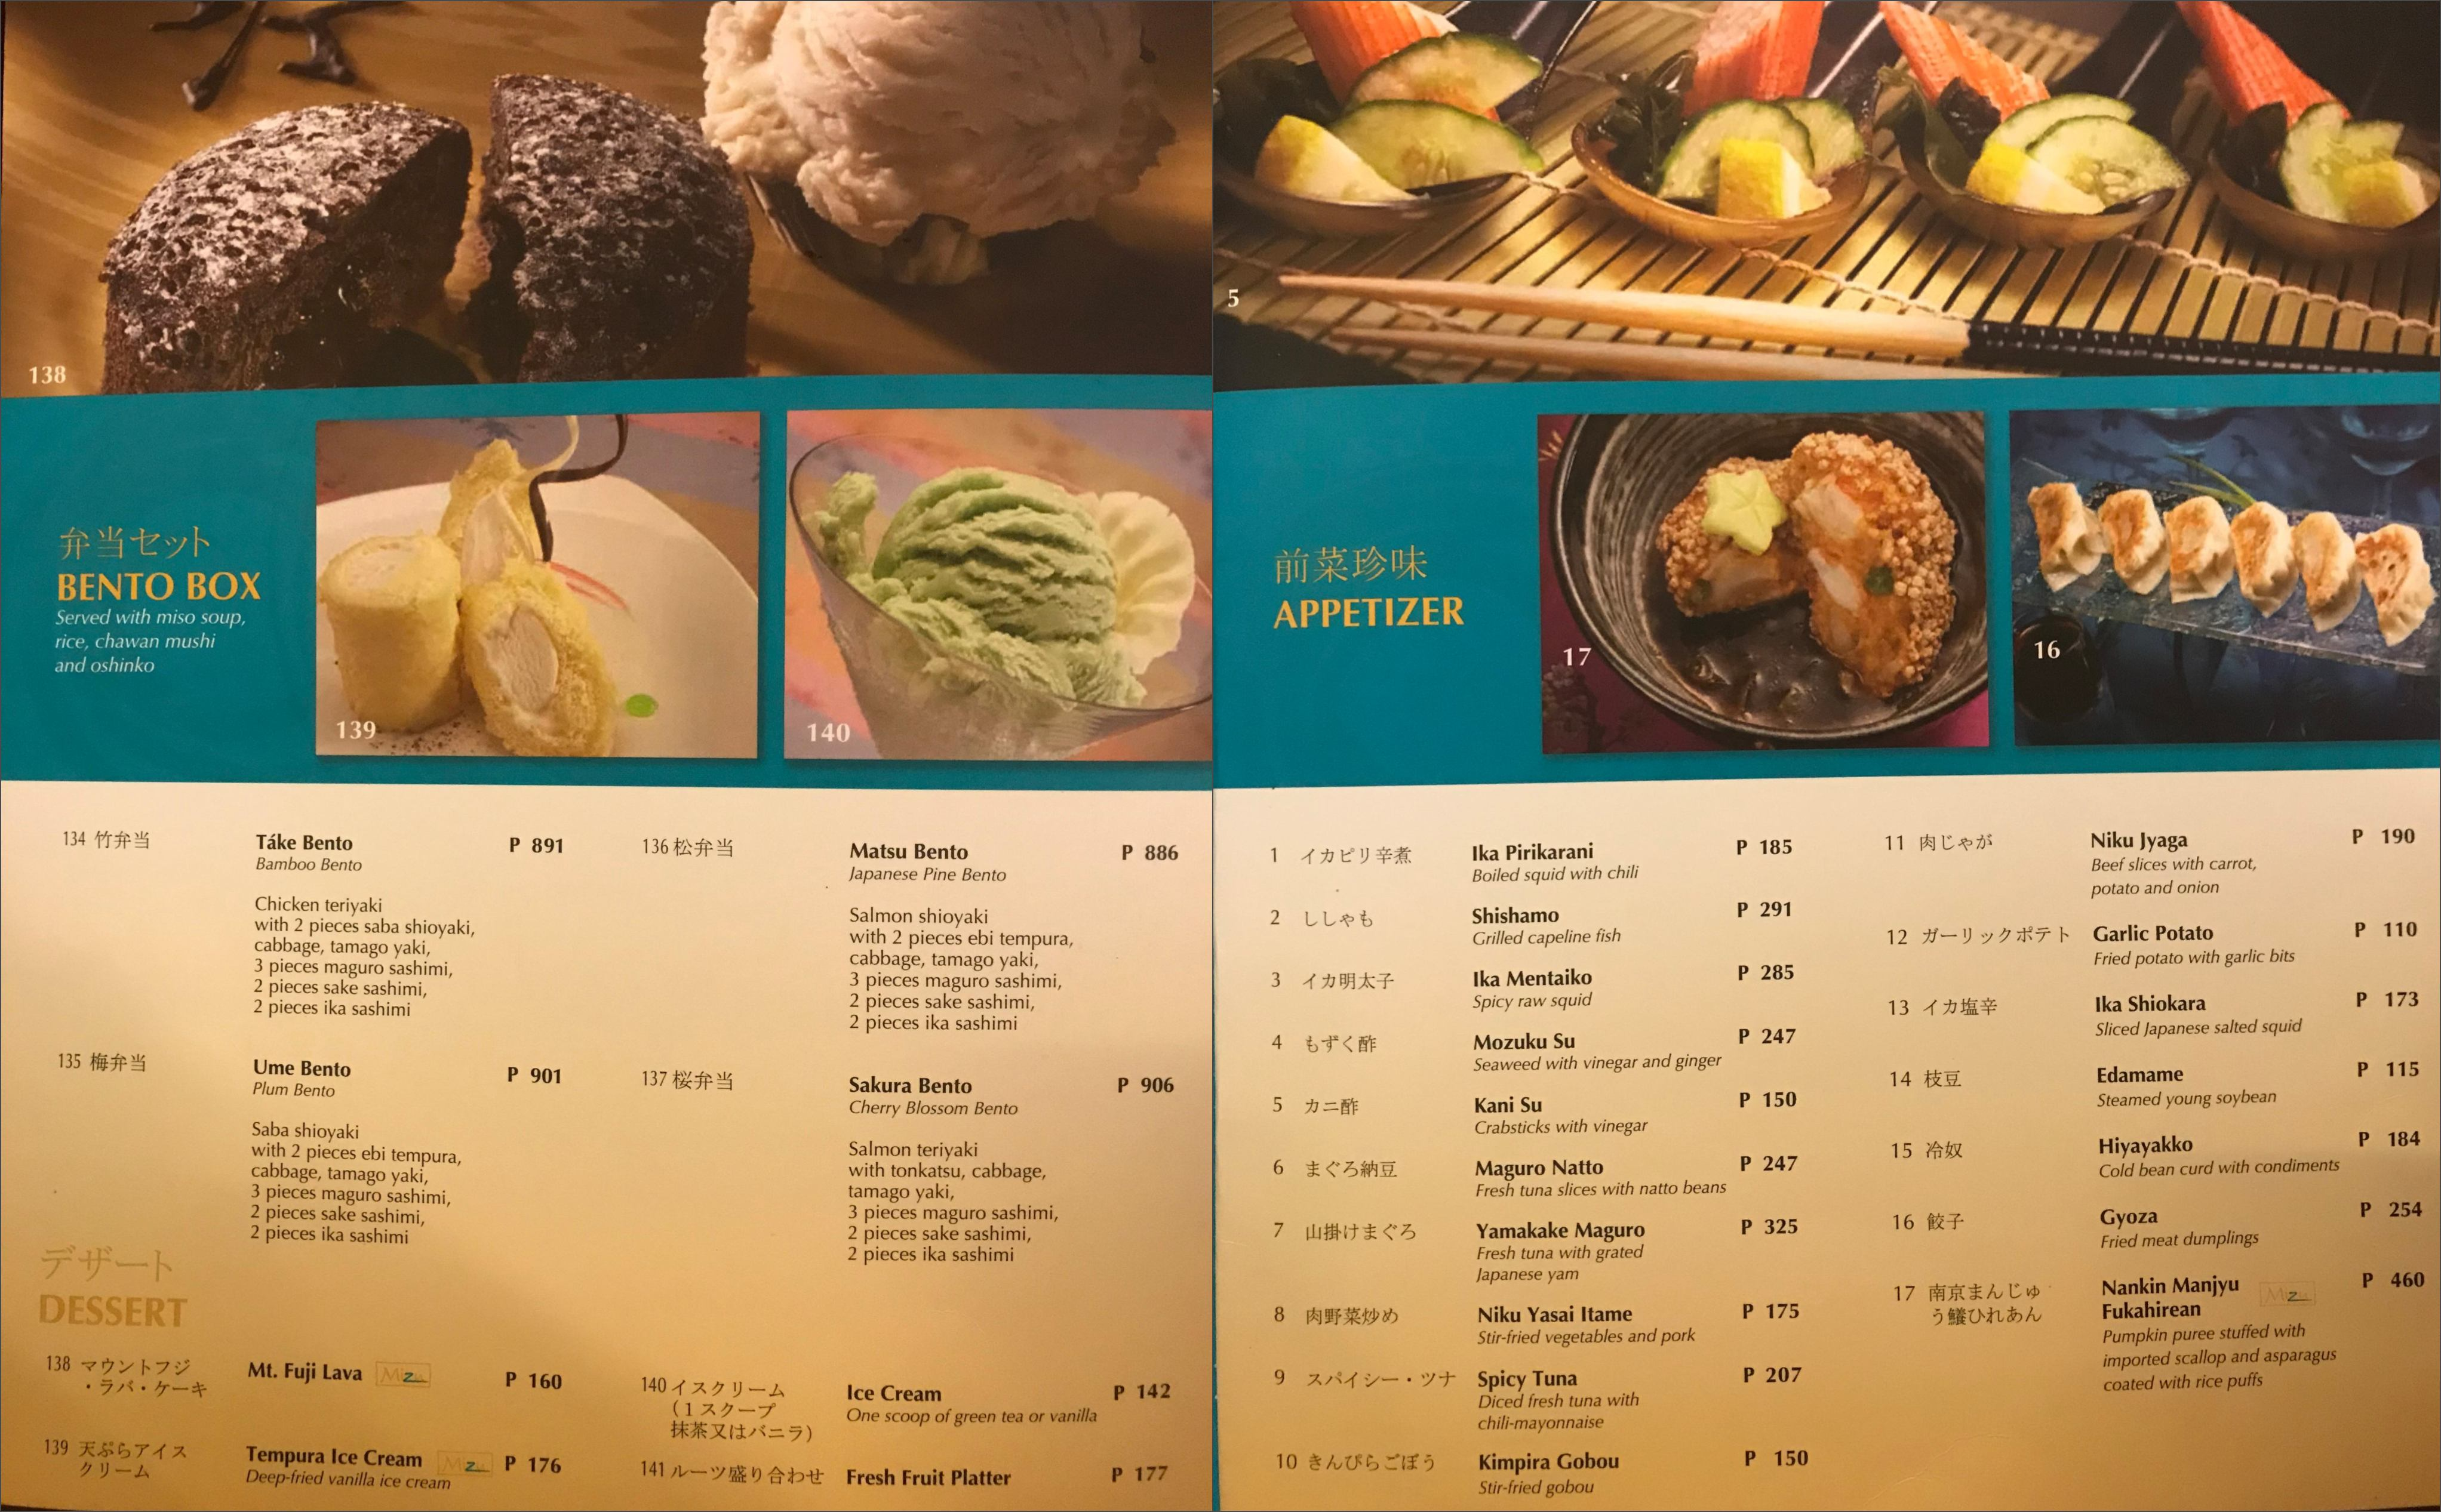 Mizu Bento Box and Appetizer